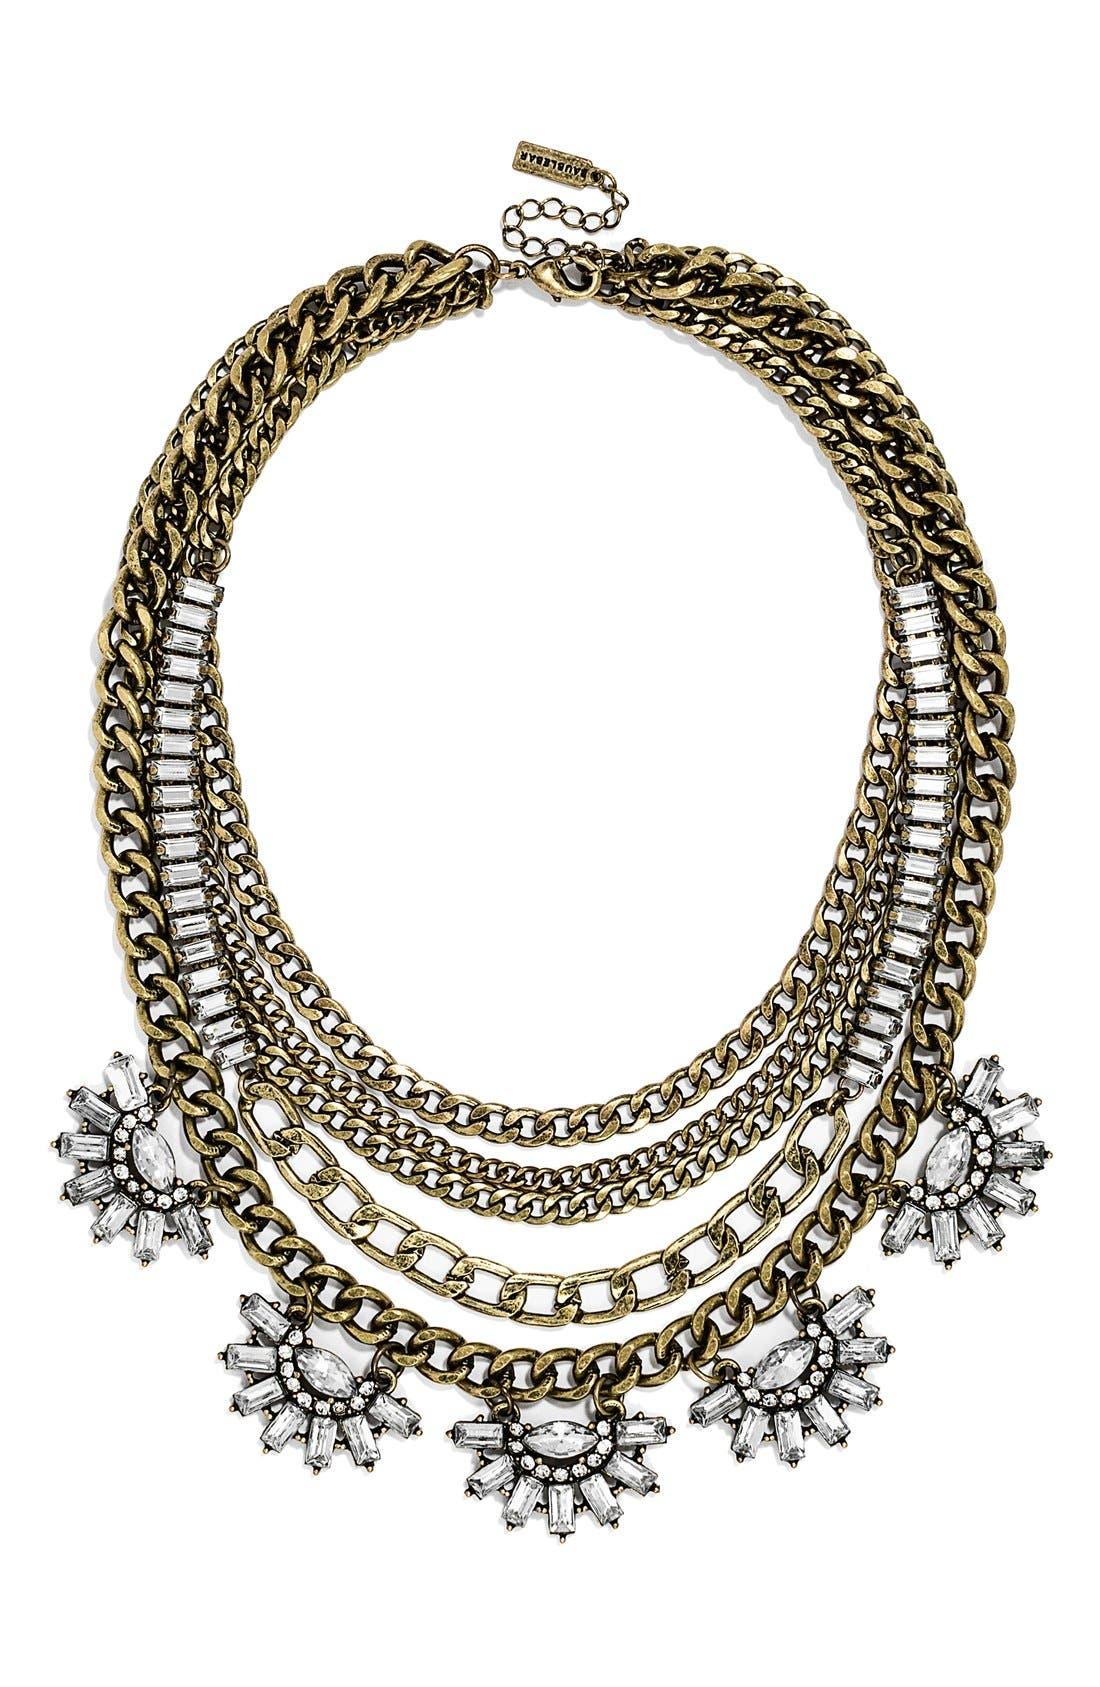 Alternate Image 1 Selected - BaubleBar 'Sundial' Chain Bib Necklace